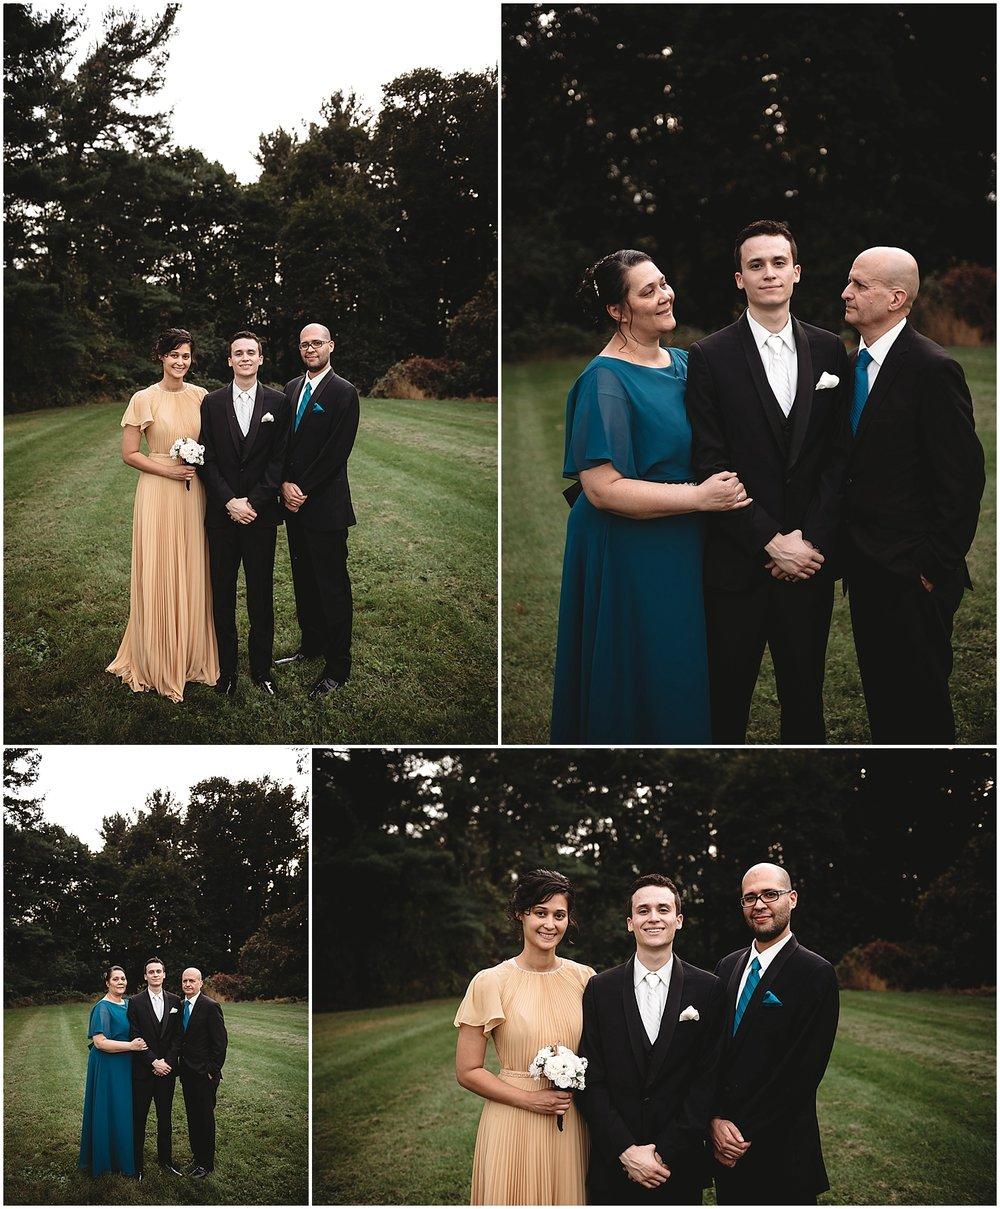 NEPA-Scranton-wedding-engagement-photographer-in-York-PA-Central-PA_0115.jpg